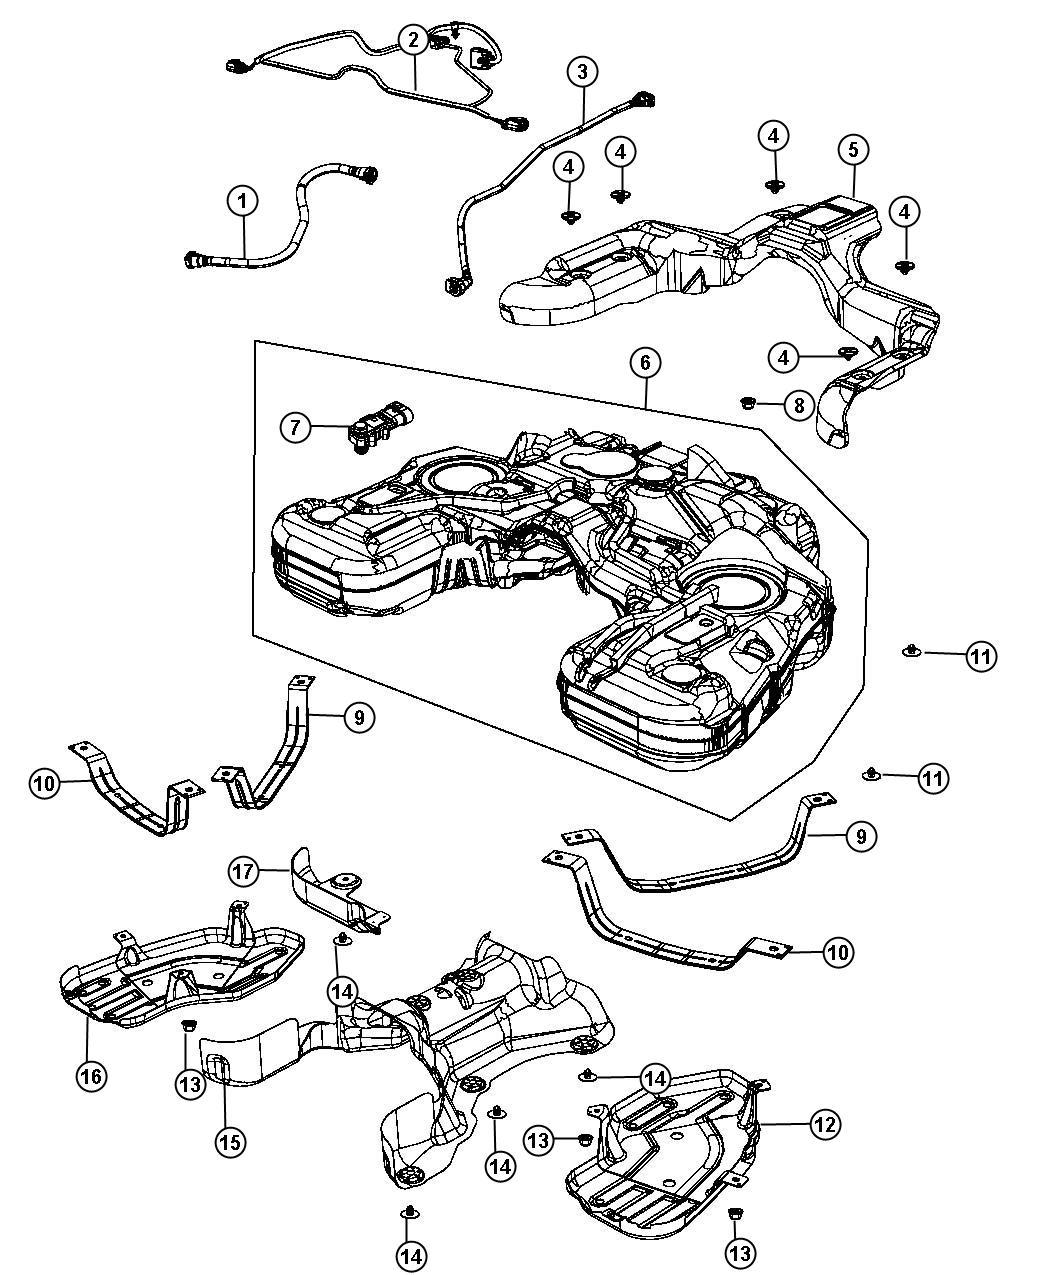 2012 Dodge Durango Wiring Diagram. 2011 Dodge Ram 2500